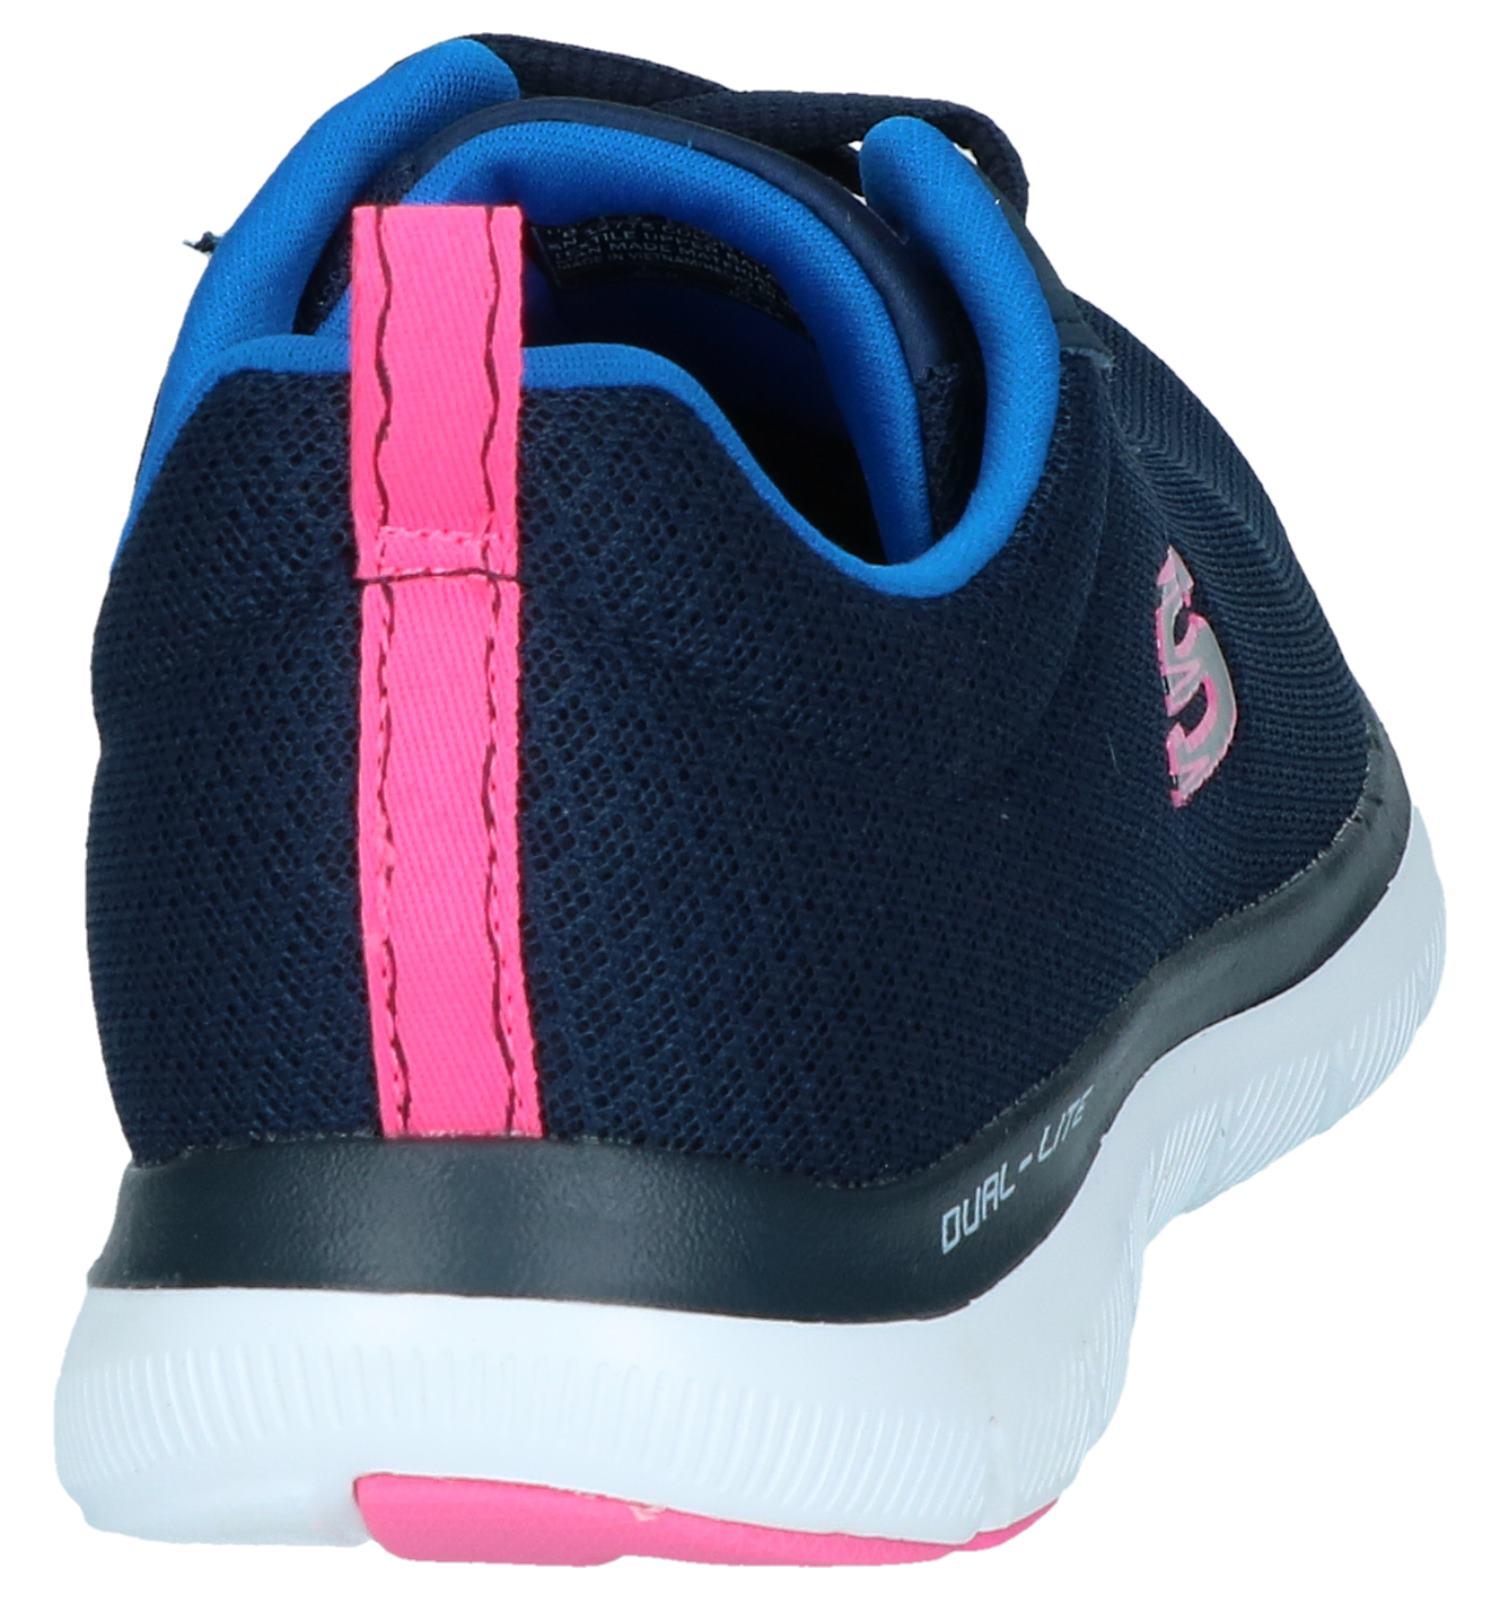 Skechers Baskets basses (Bleu foncé) | TORFS.BE | Livraison